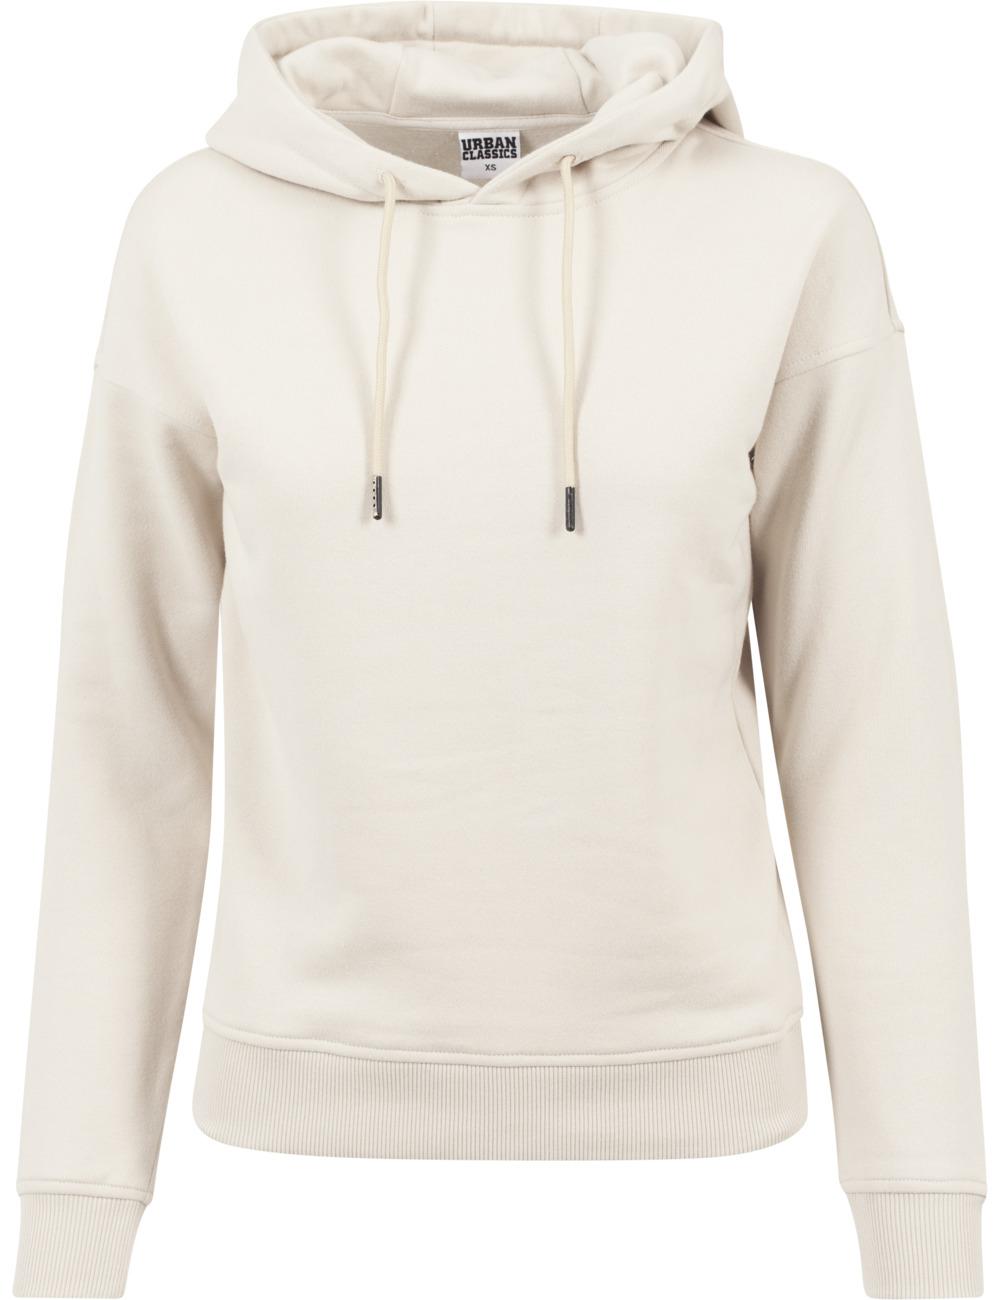 Urban Classics Damen Sweater Hoody L, Sand (20208)